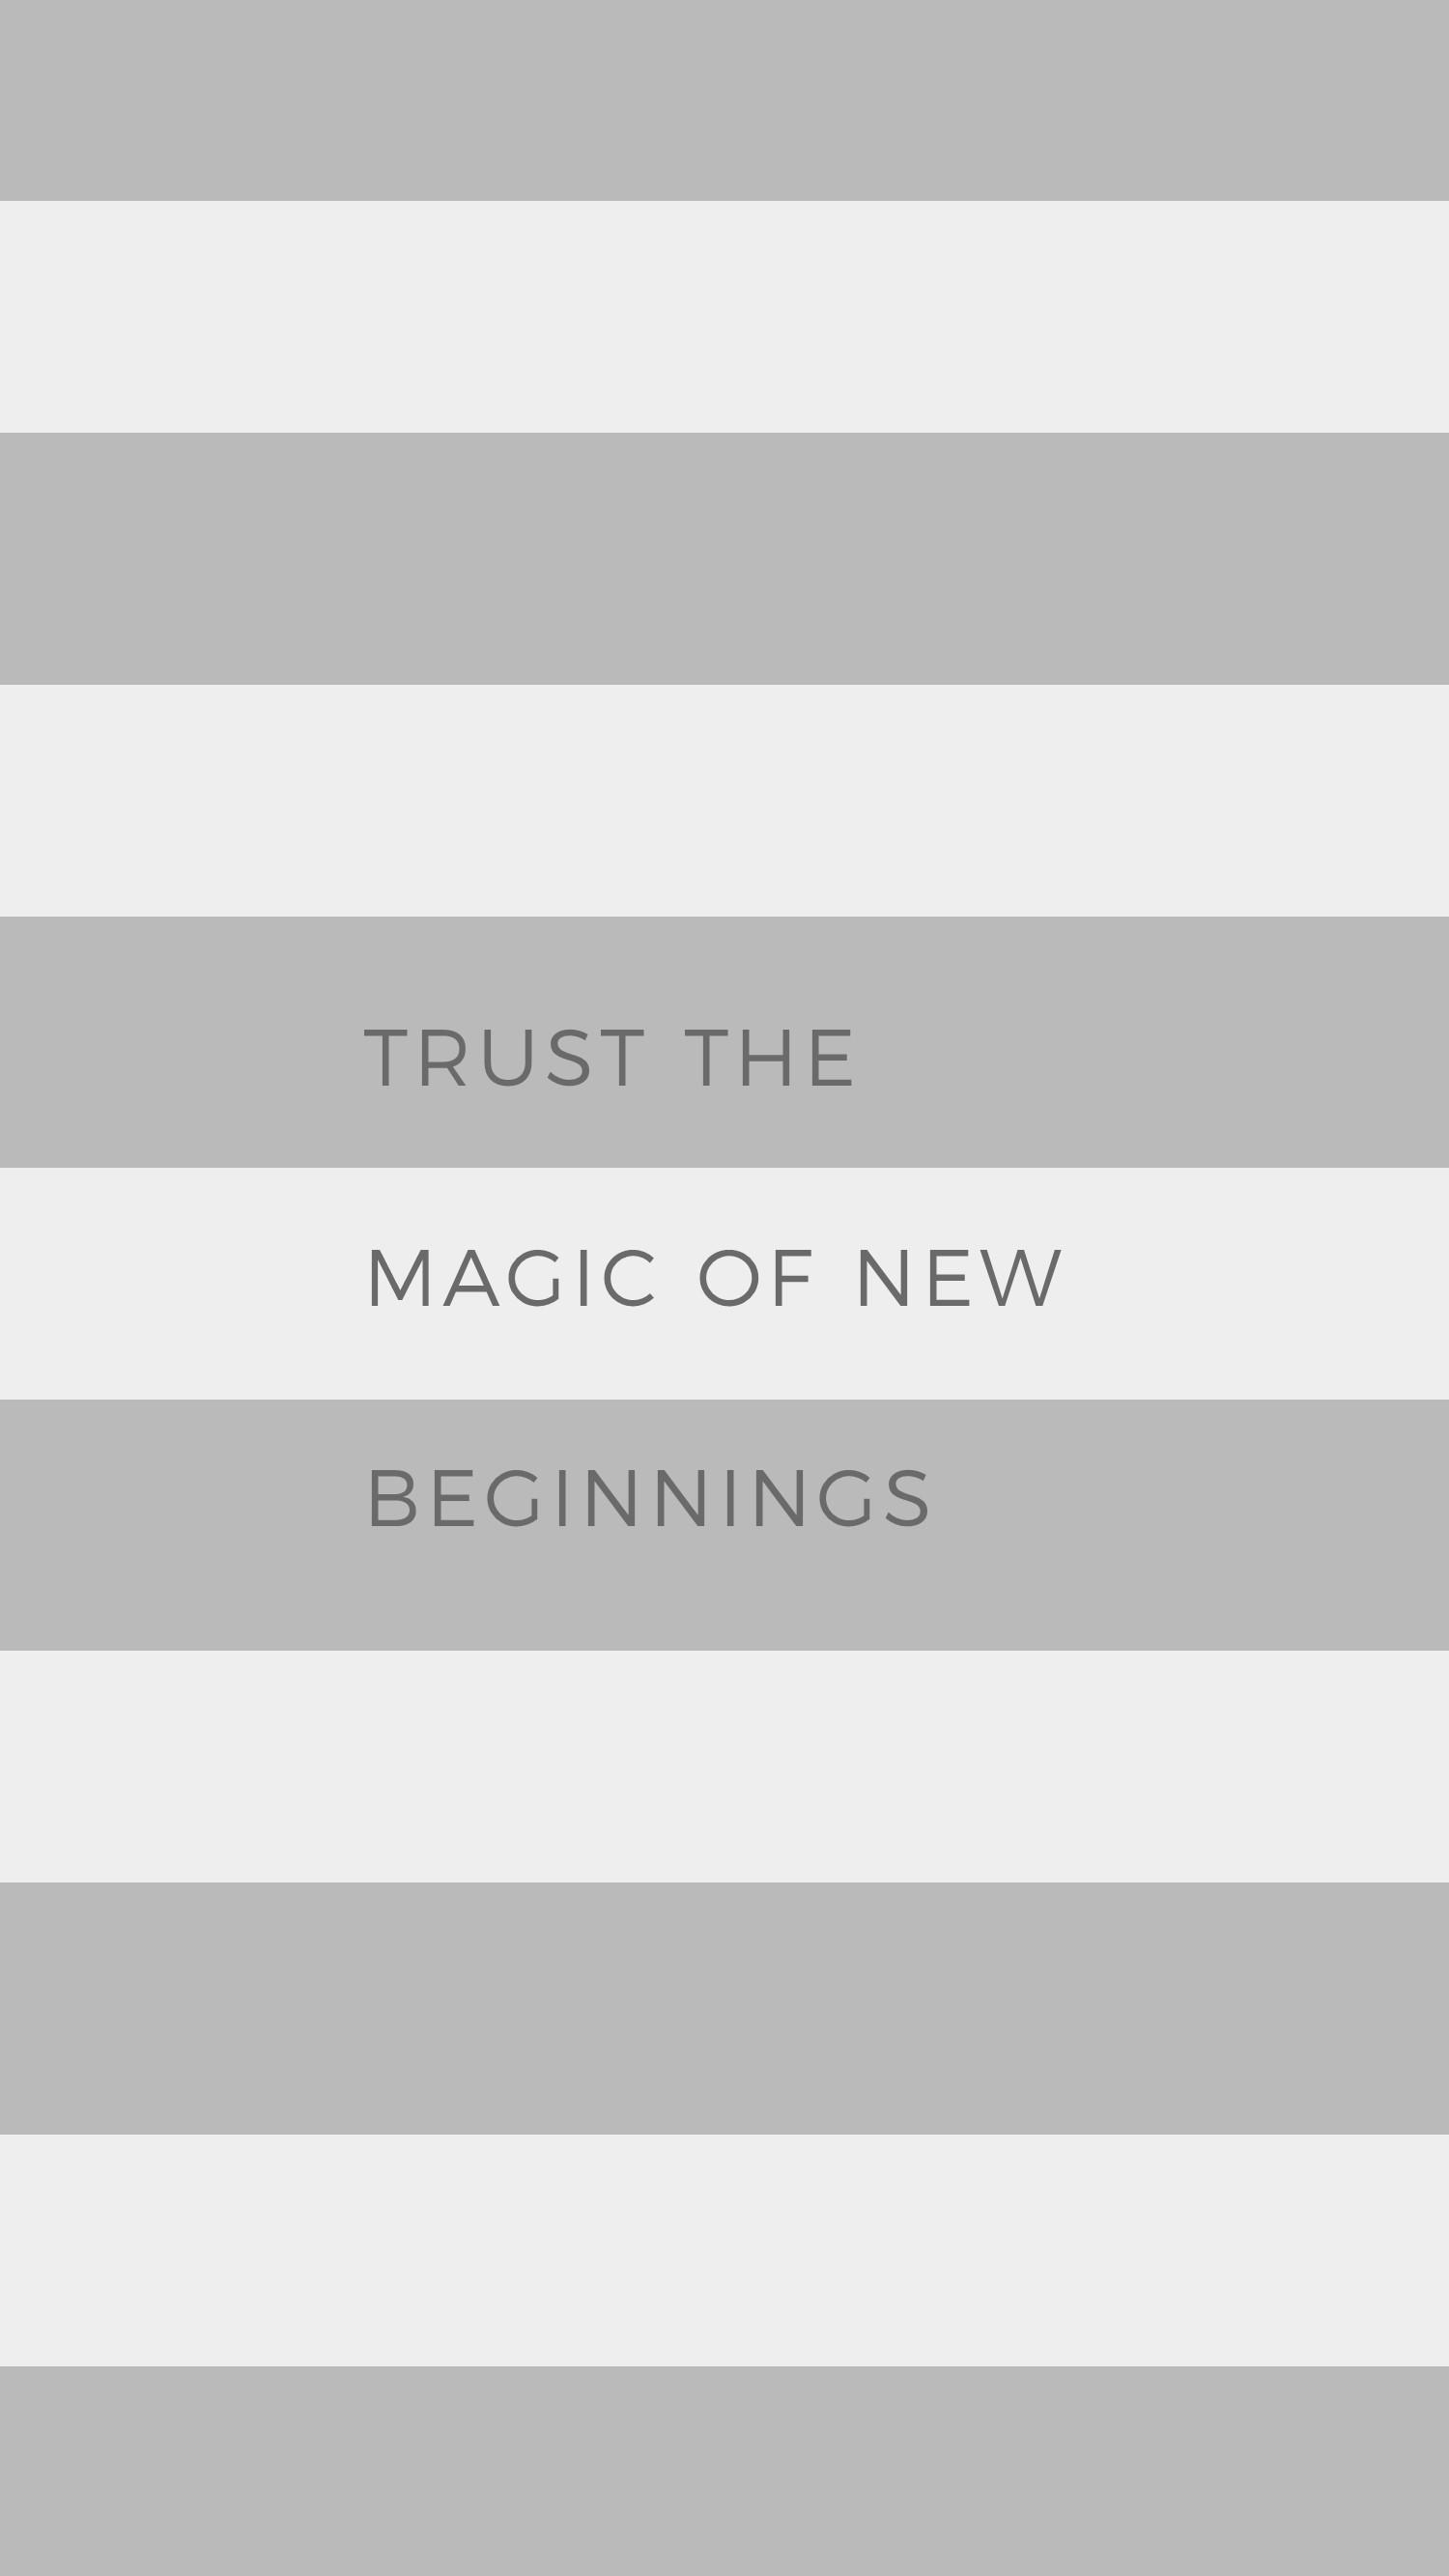 magic of new beginnings.jpg